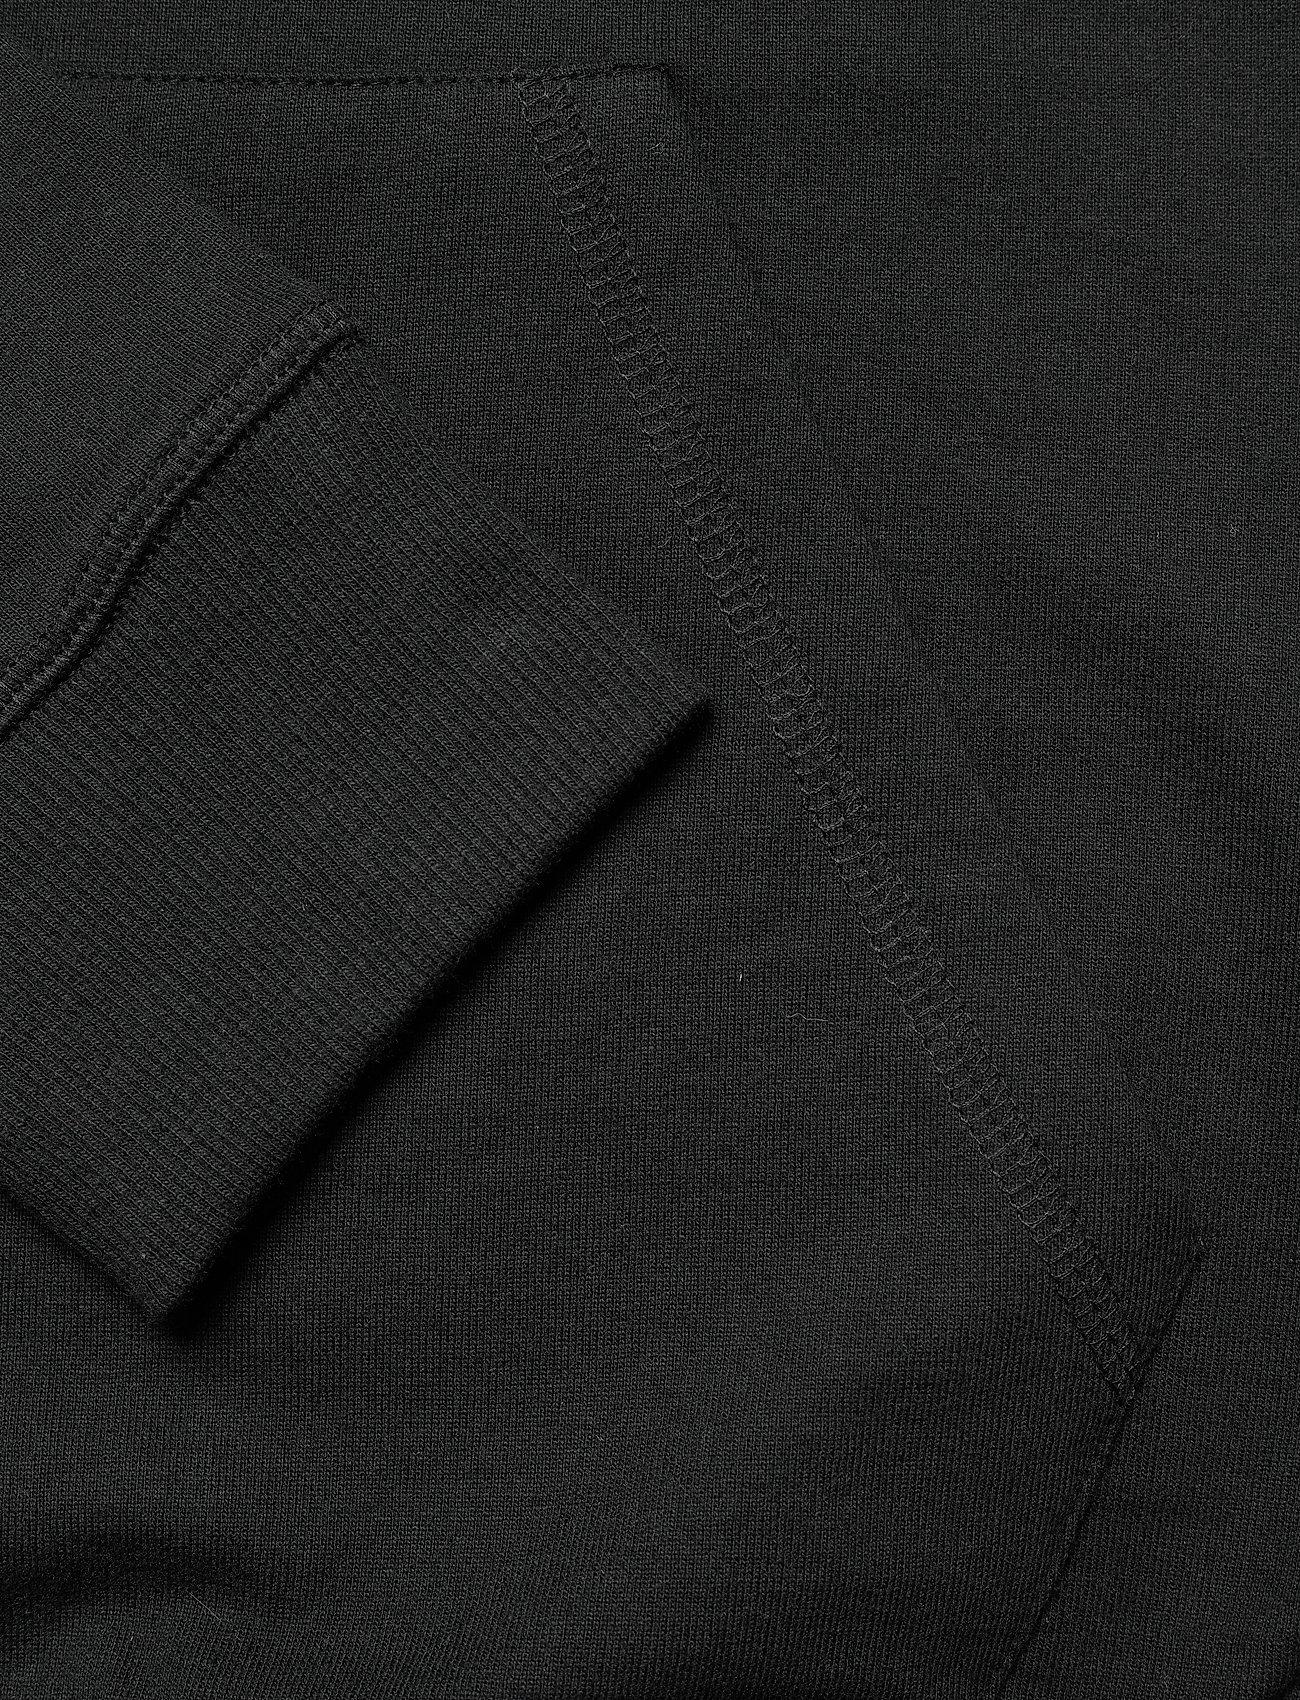 Minimum storms - Sweatshirts BLACK - Menn Klær